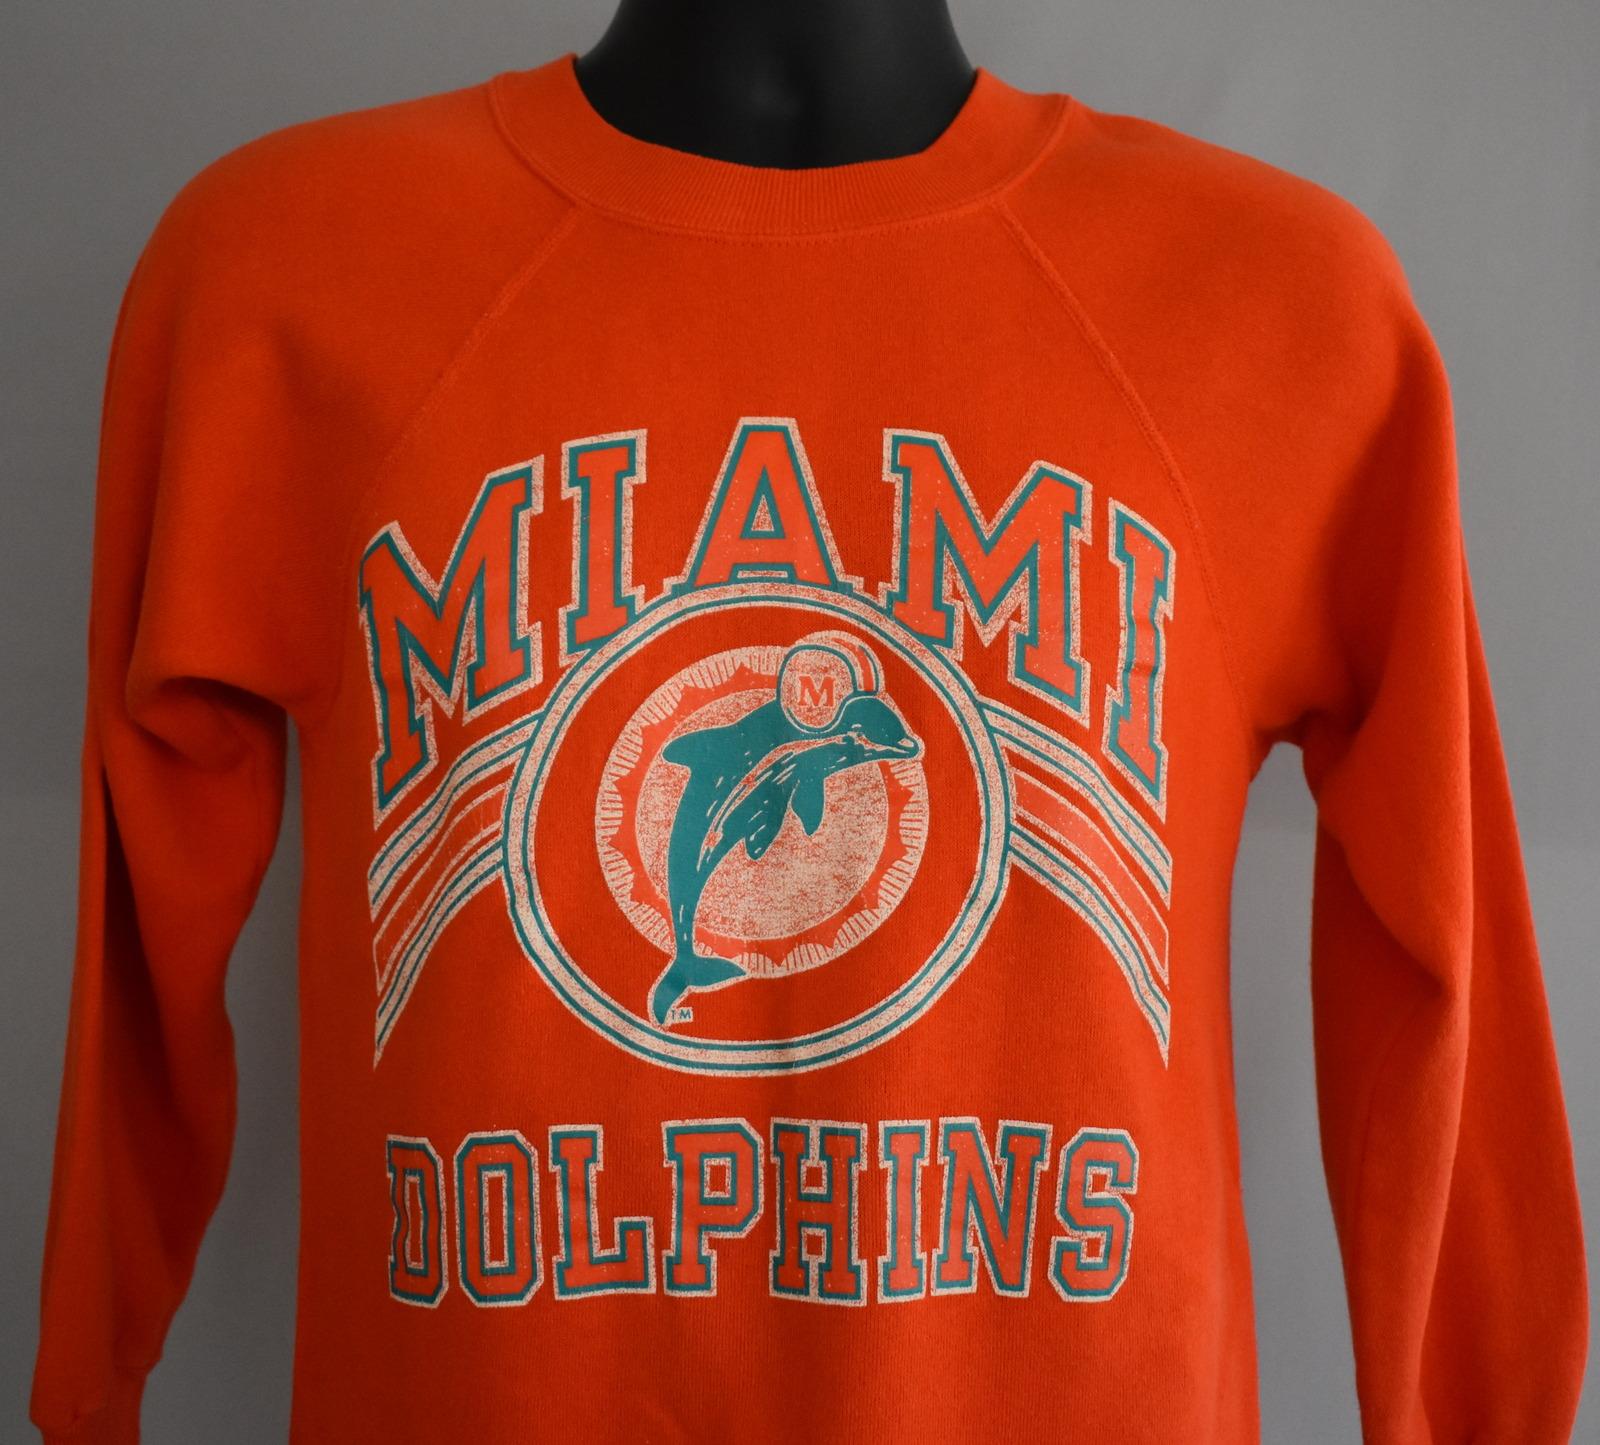 Vintage 80s Miami Dolphins Raglan Sweatshirt Crewneck Size XS to S